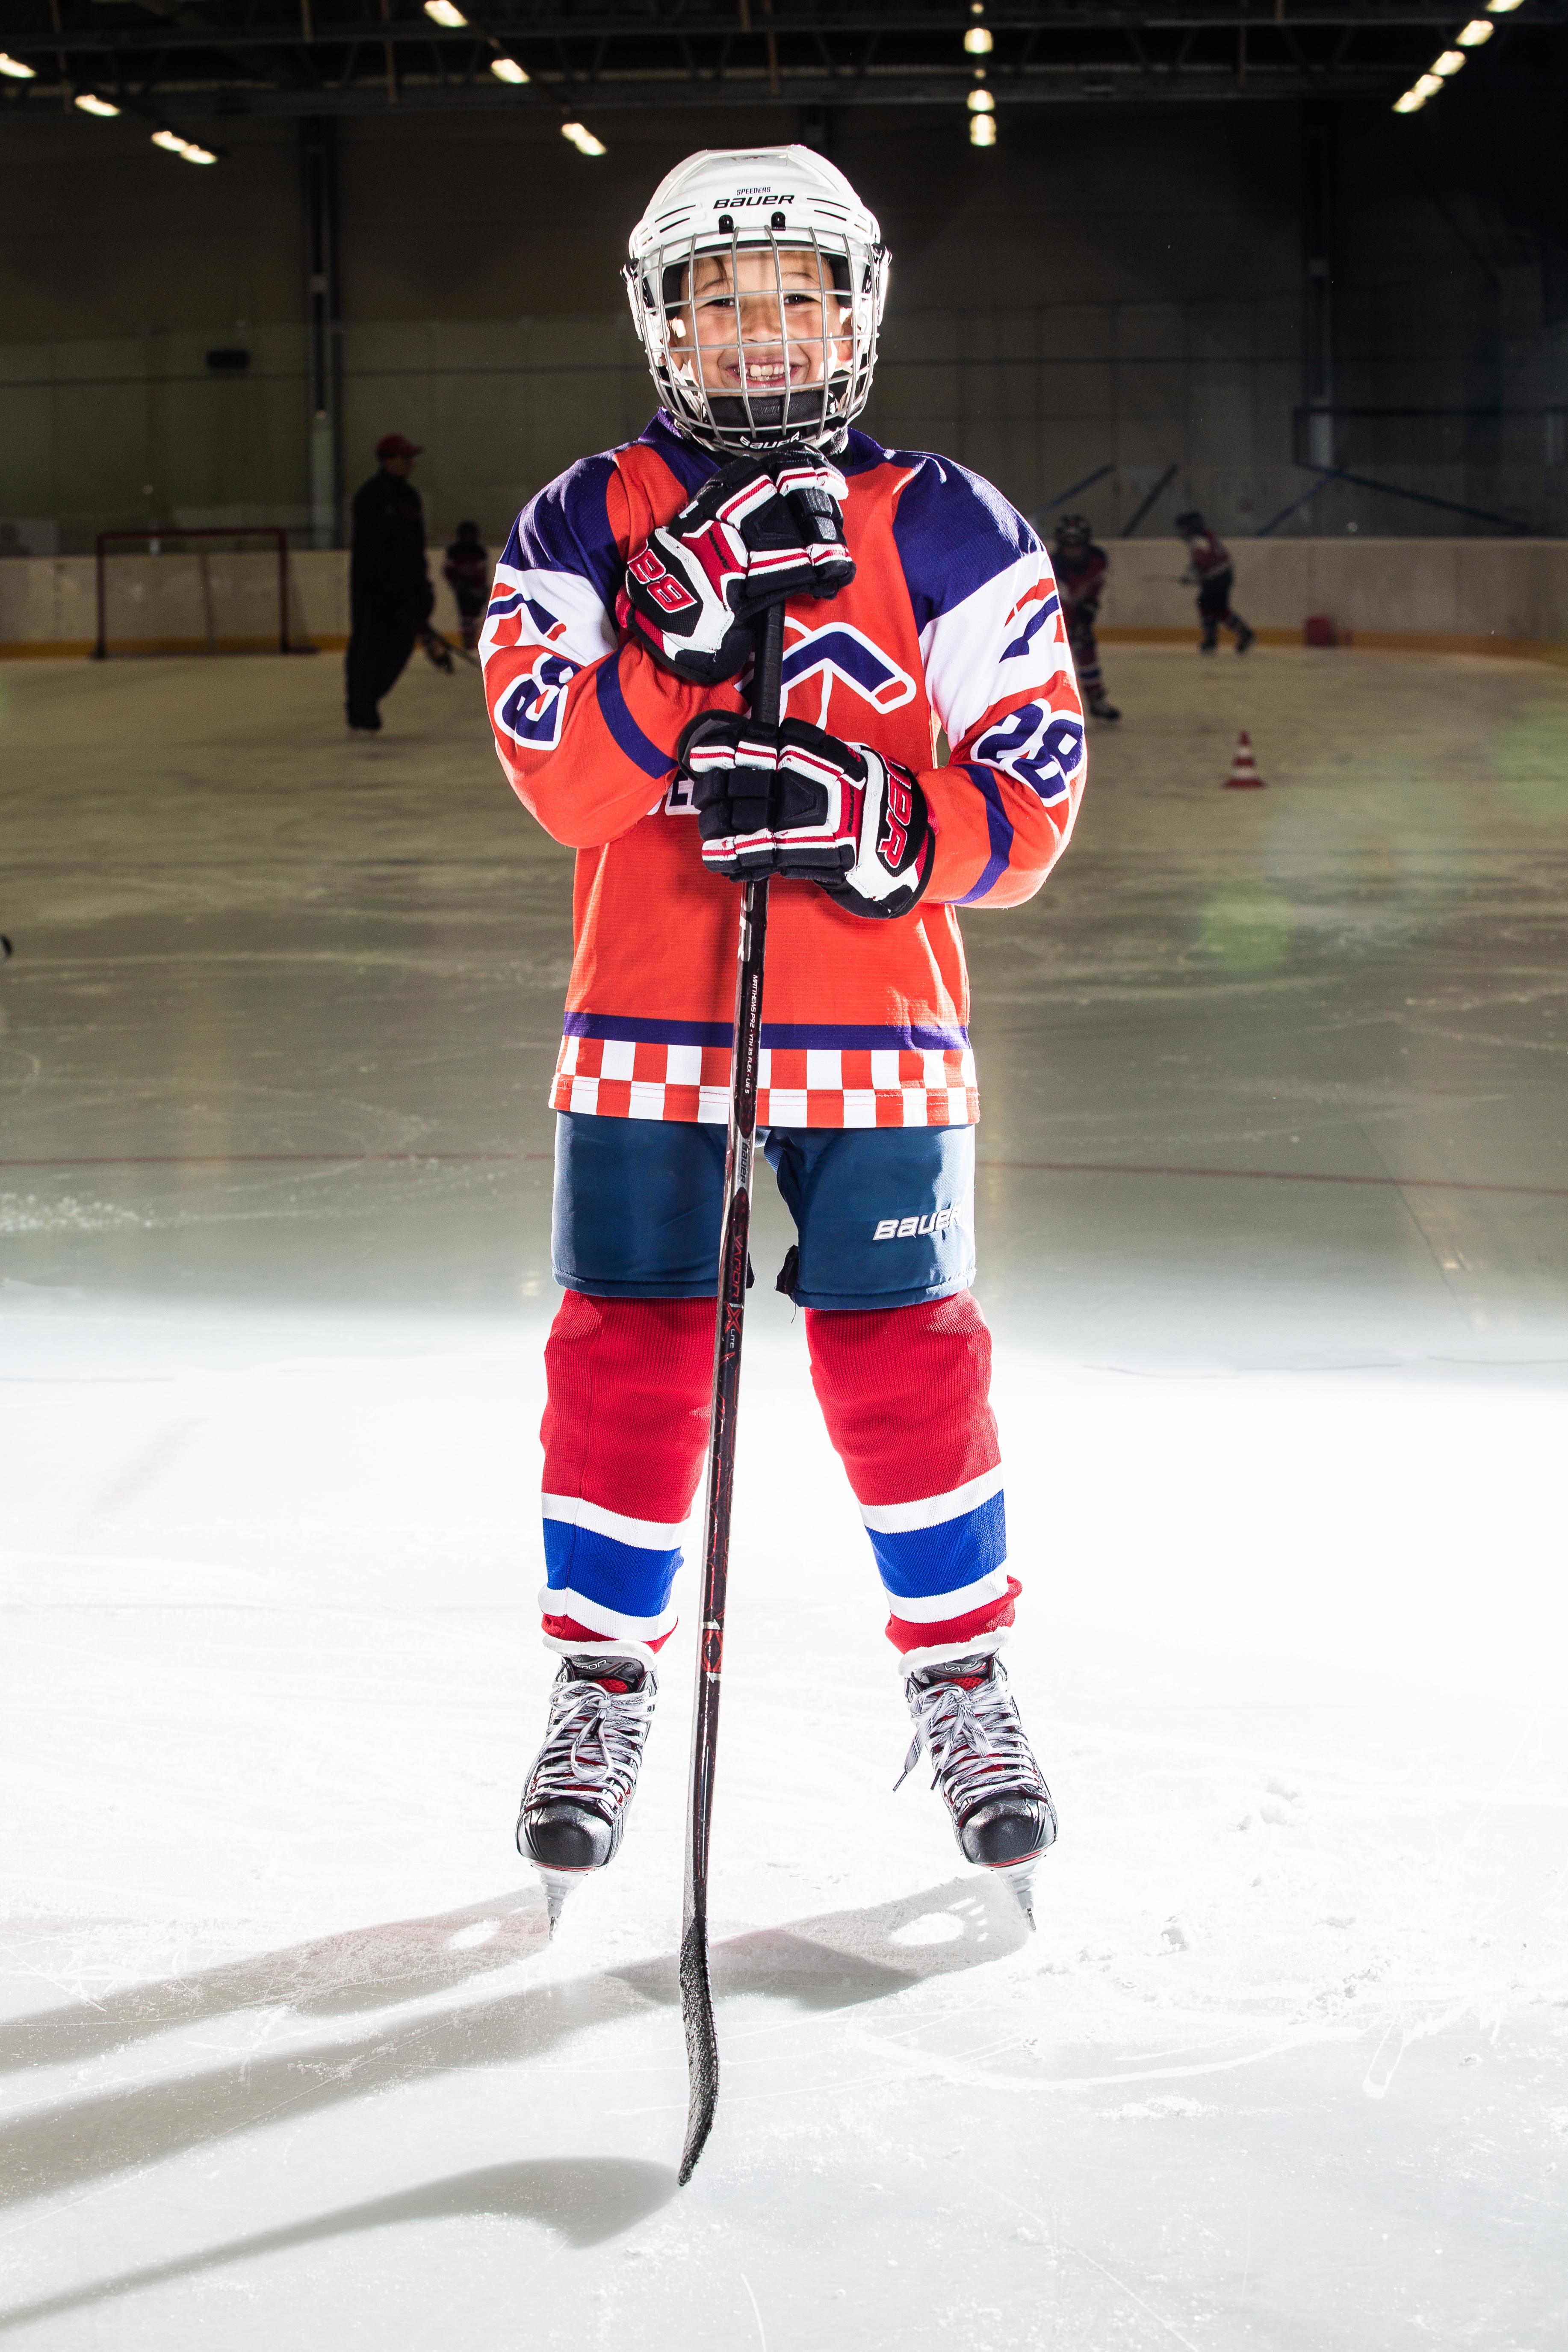 Kristian Hrabovsky Speeders Bratislava cislo 28 postoj